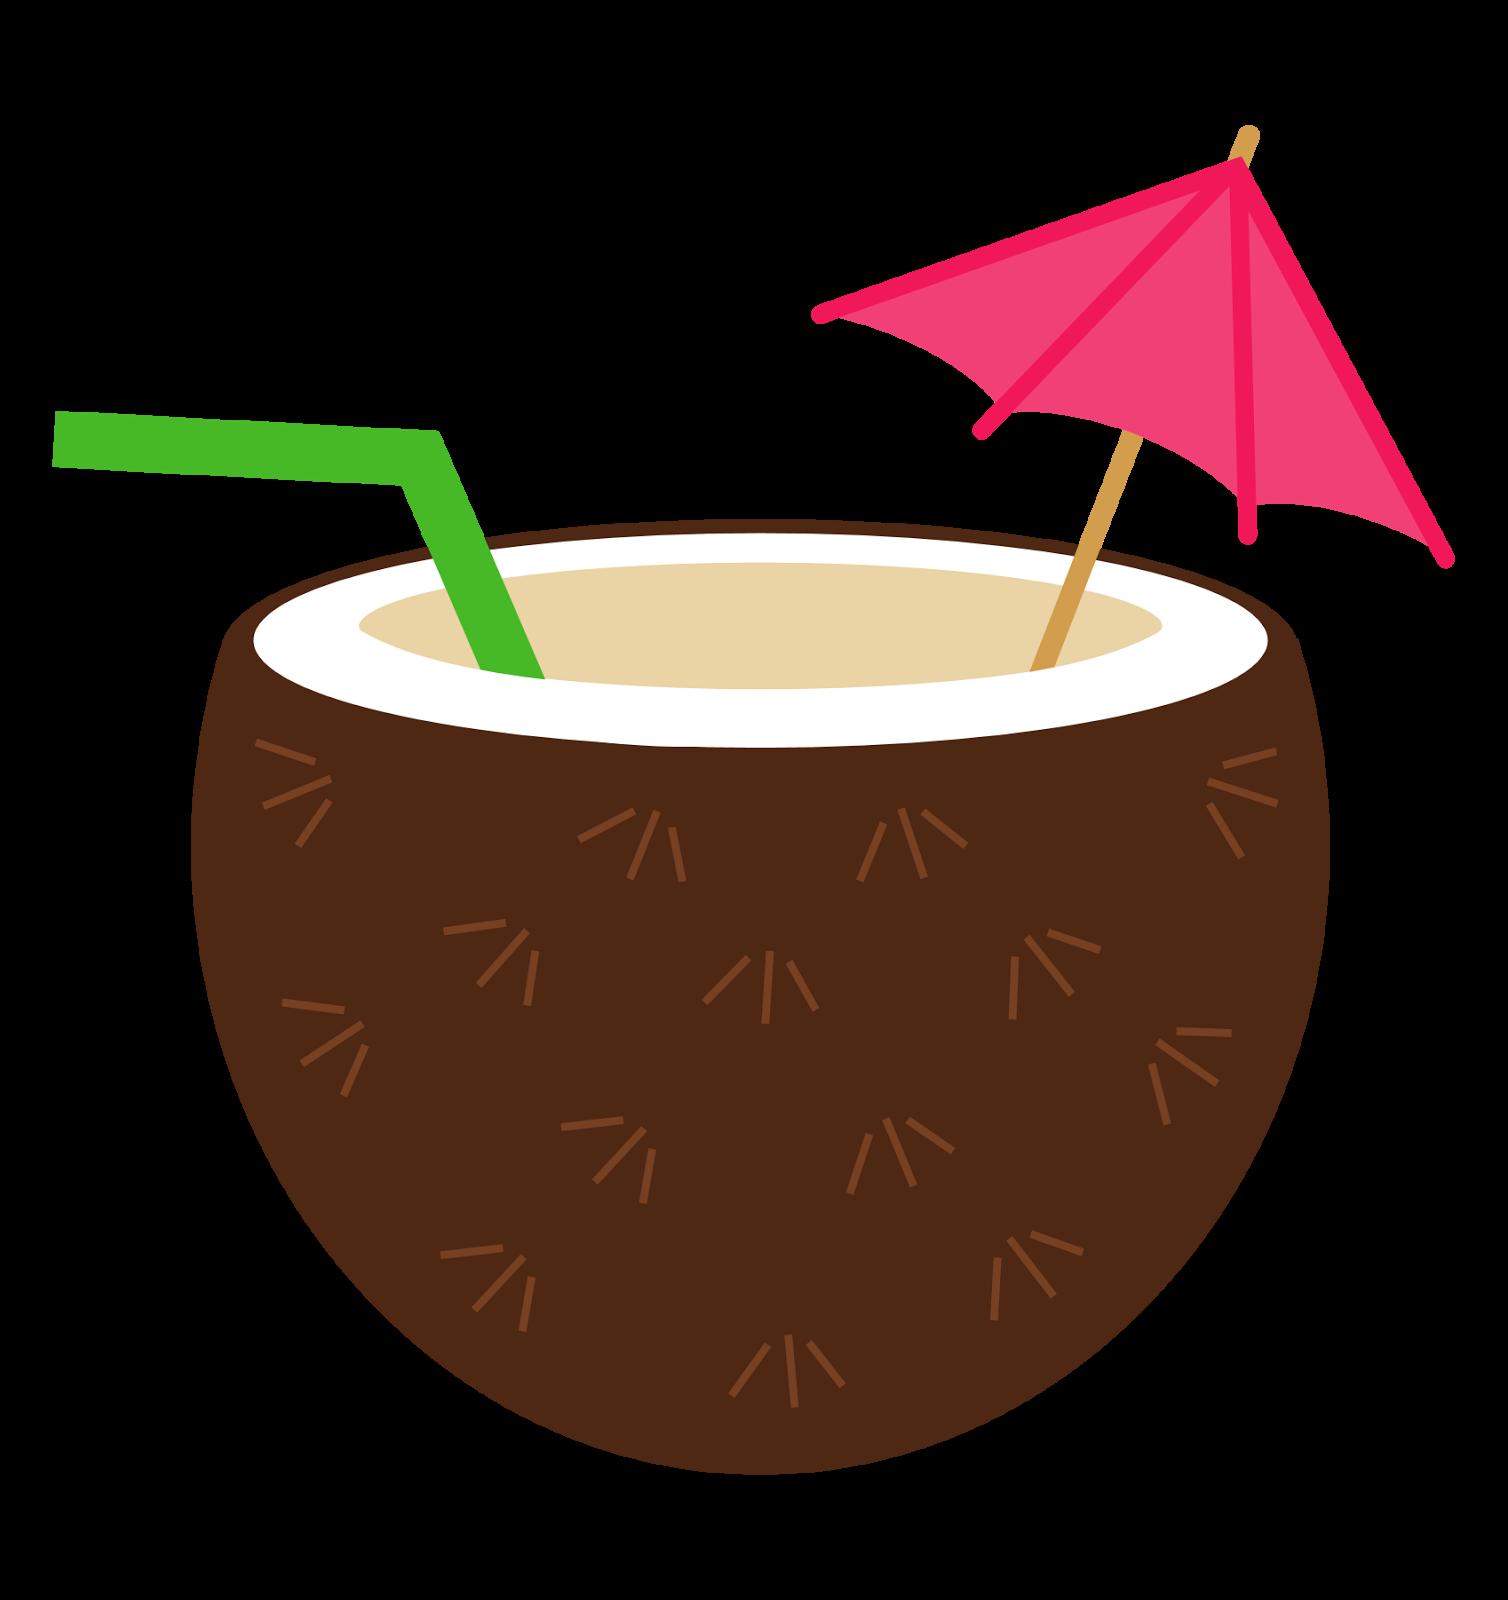 coconut clipart-coconut clipart-5